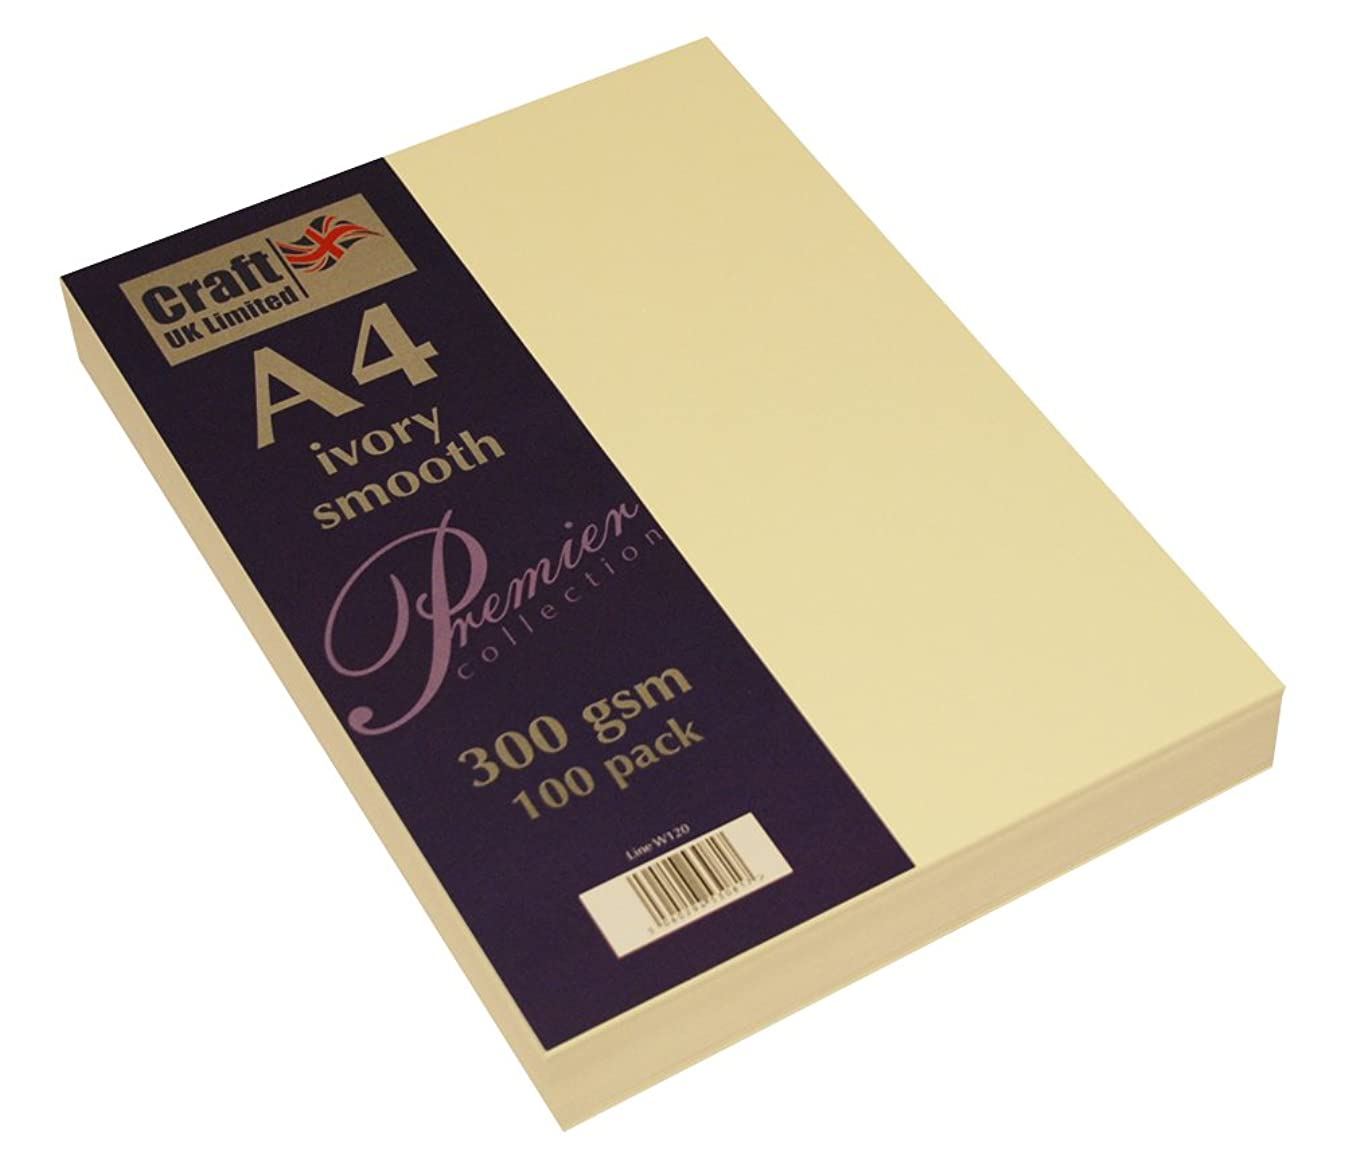 Craft UK A4 300Gsm-100 Sheets, Ivory Card 300gsm, 29.6 x 21 x 0.1 cm